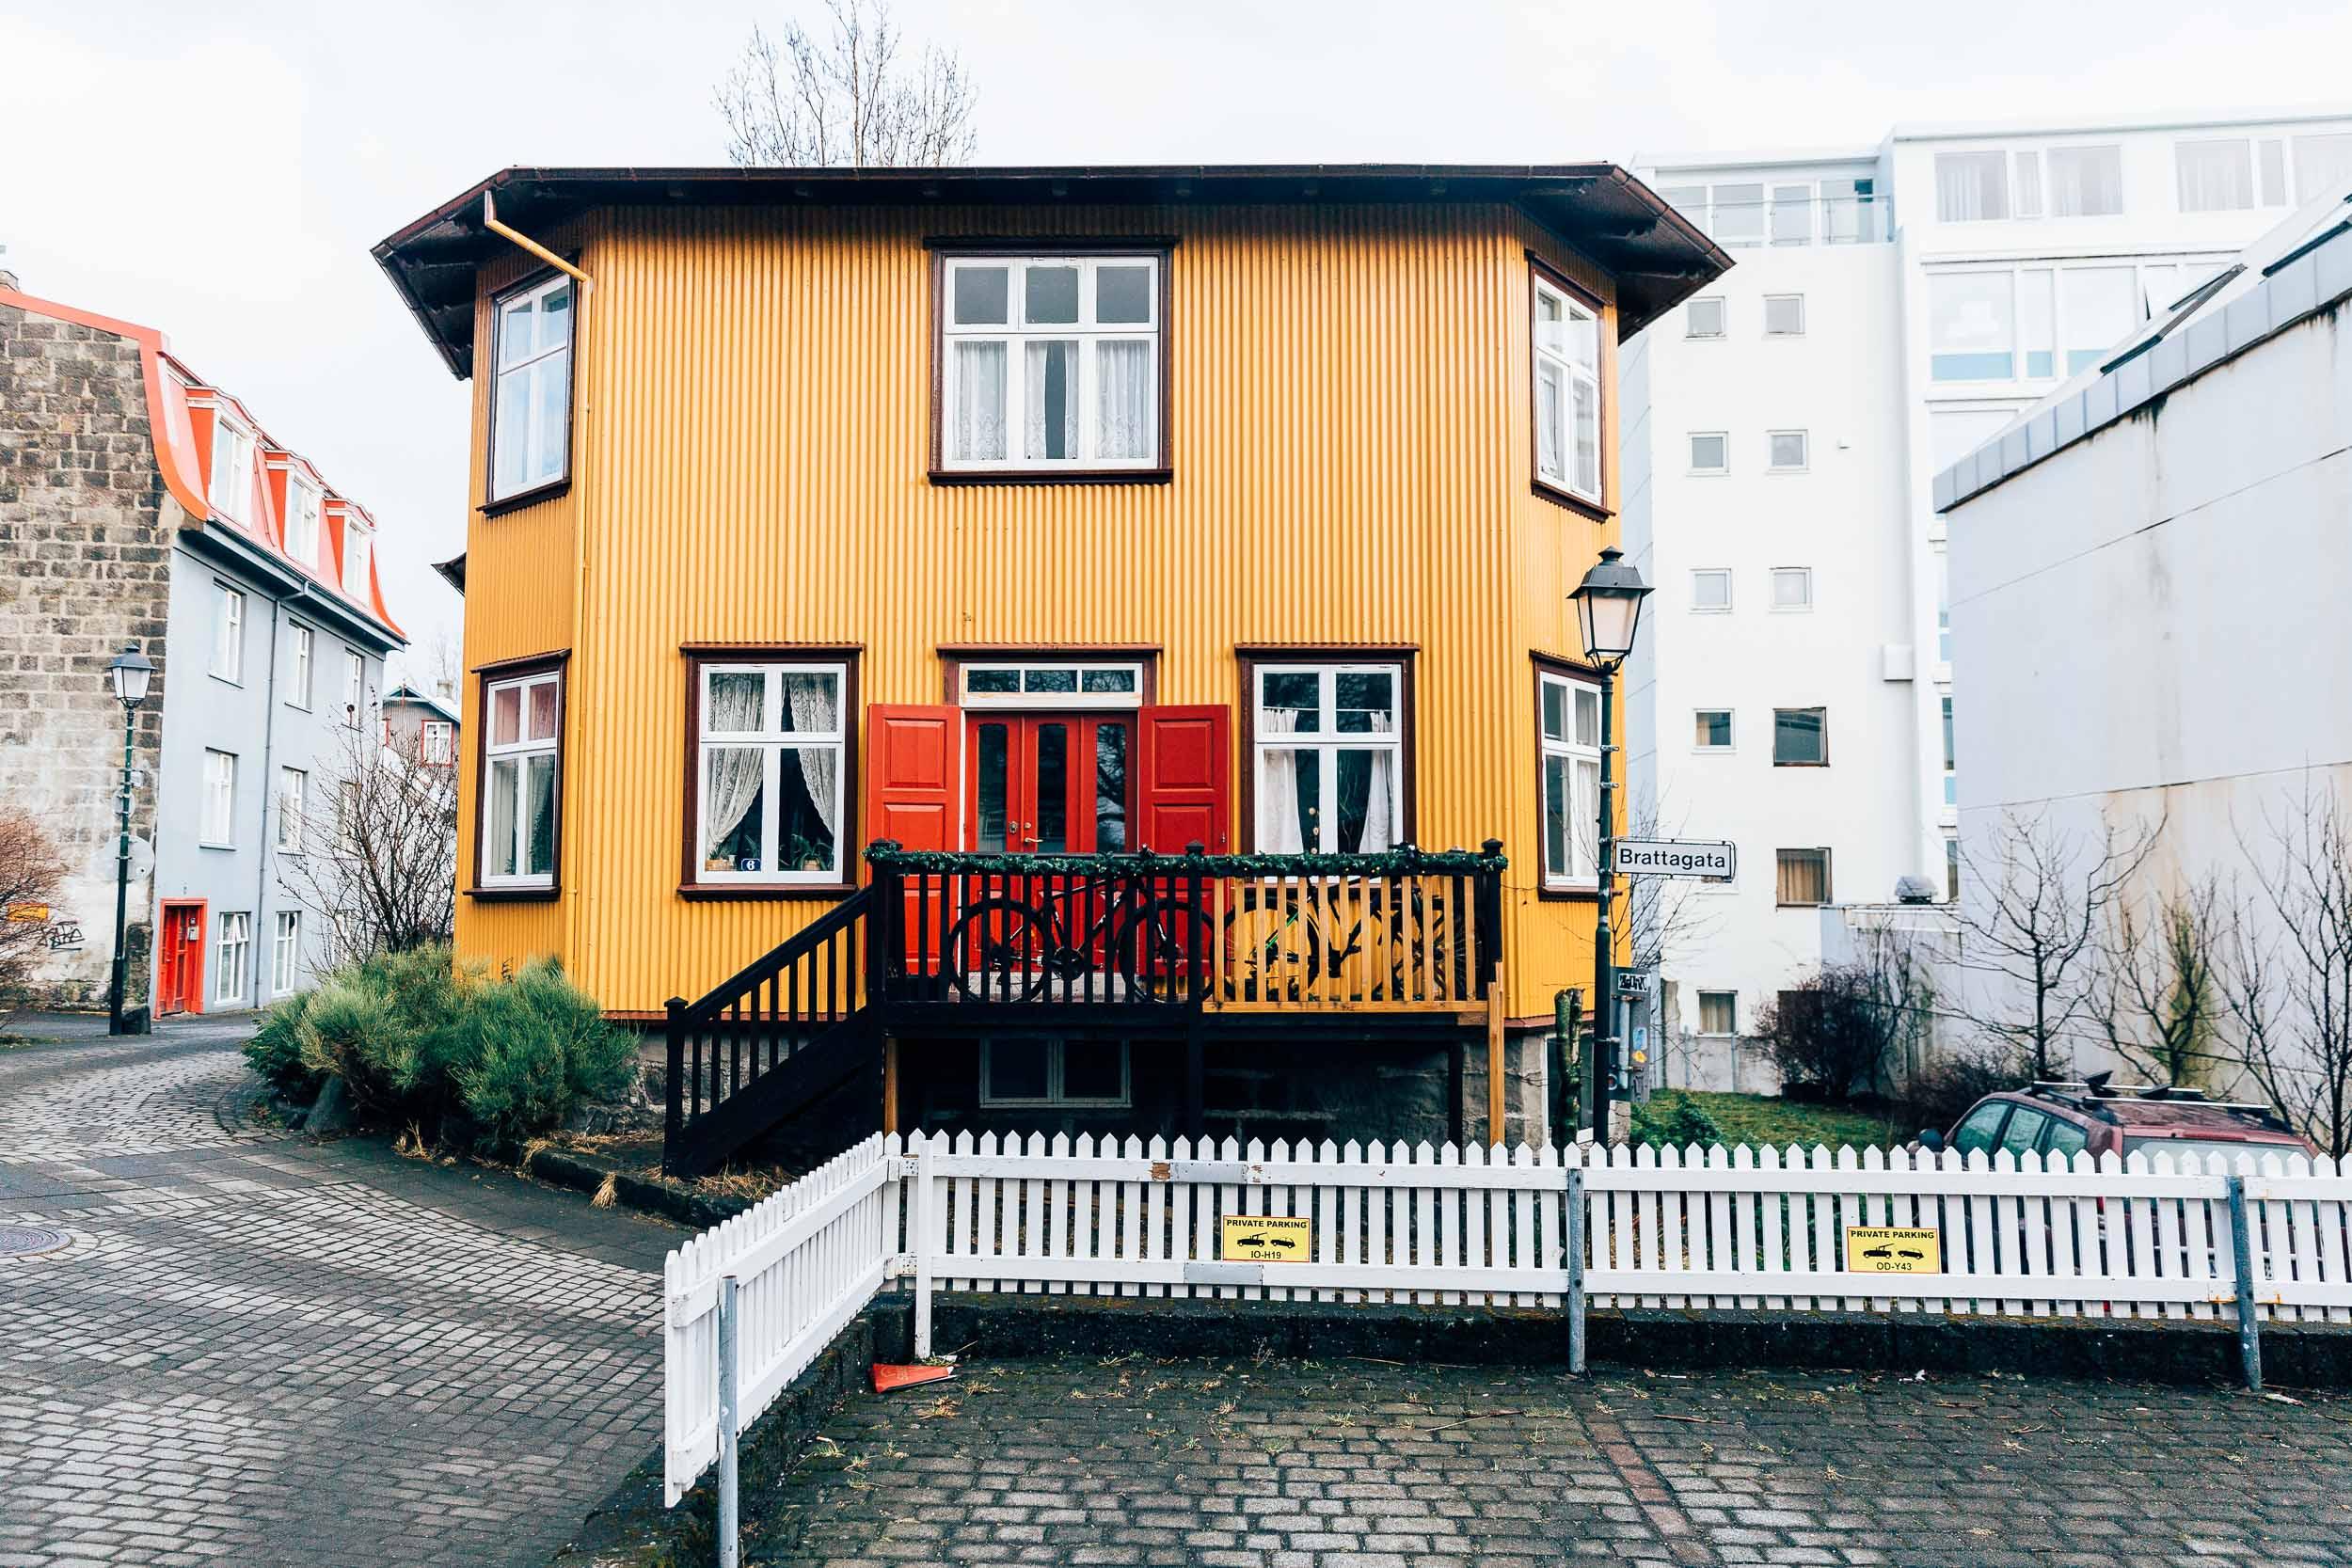 02_2019_Iceland-21.jpg